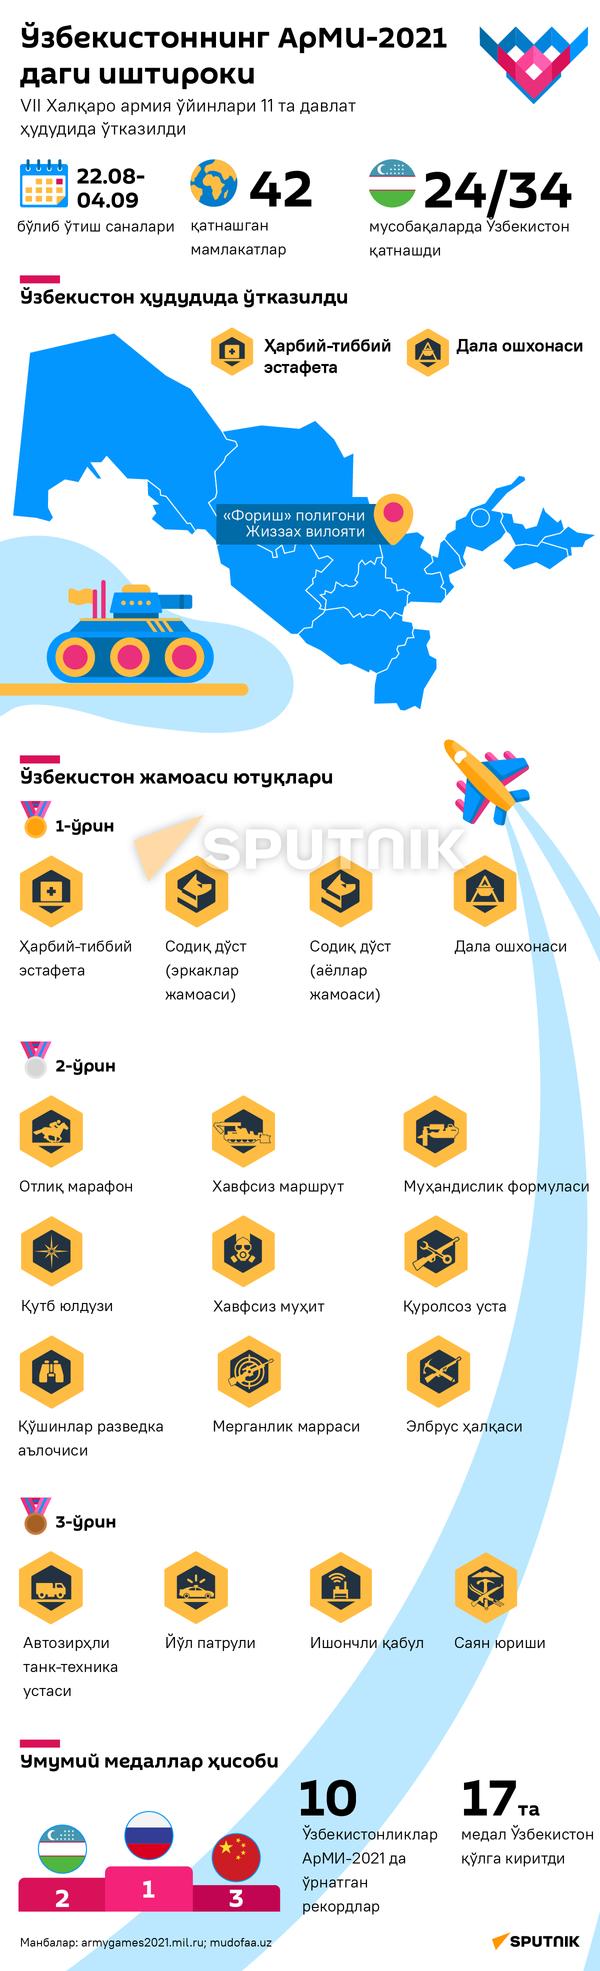 Uzbekistan na ArMI-2021 uzb.versiya - Sputnik Oʻzbekiston